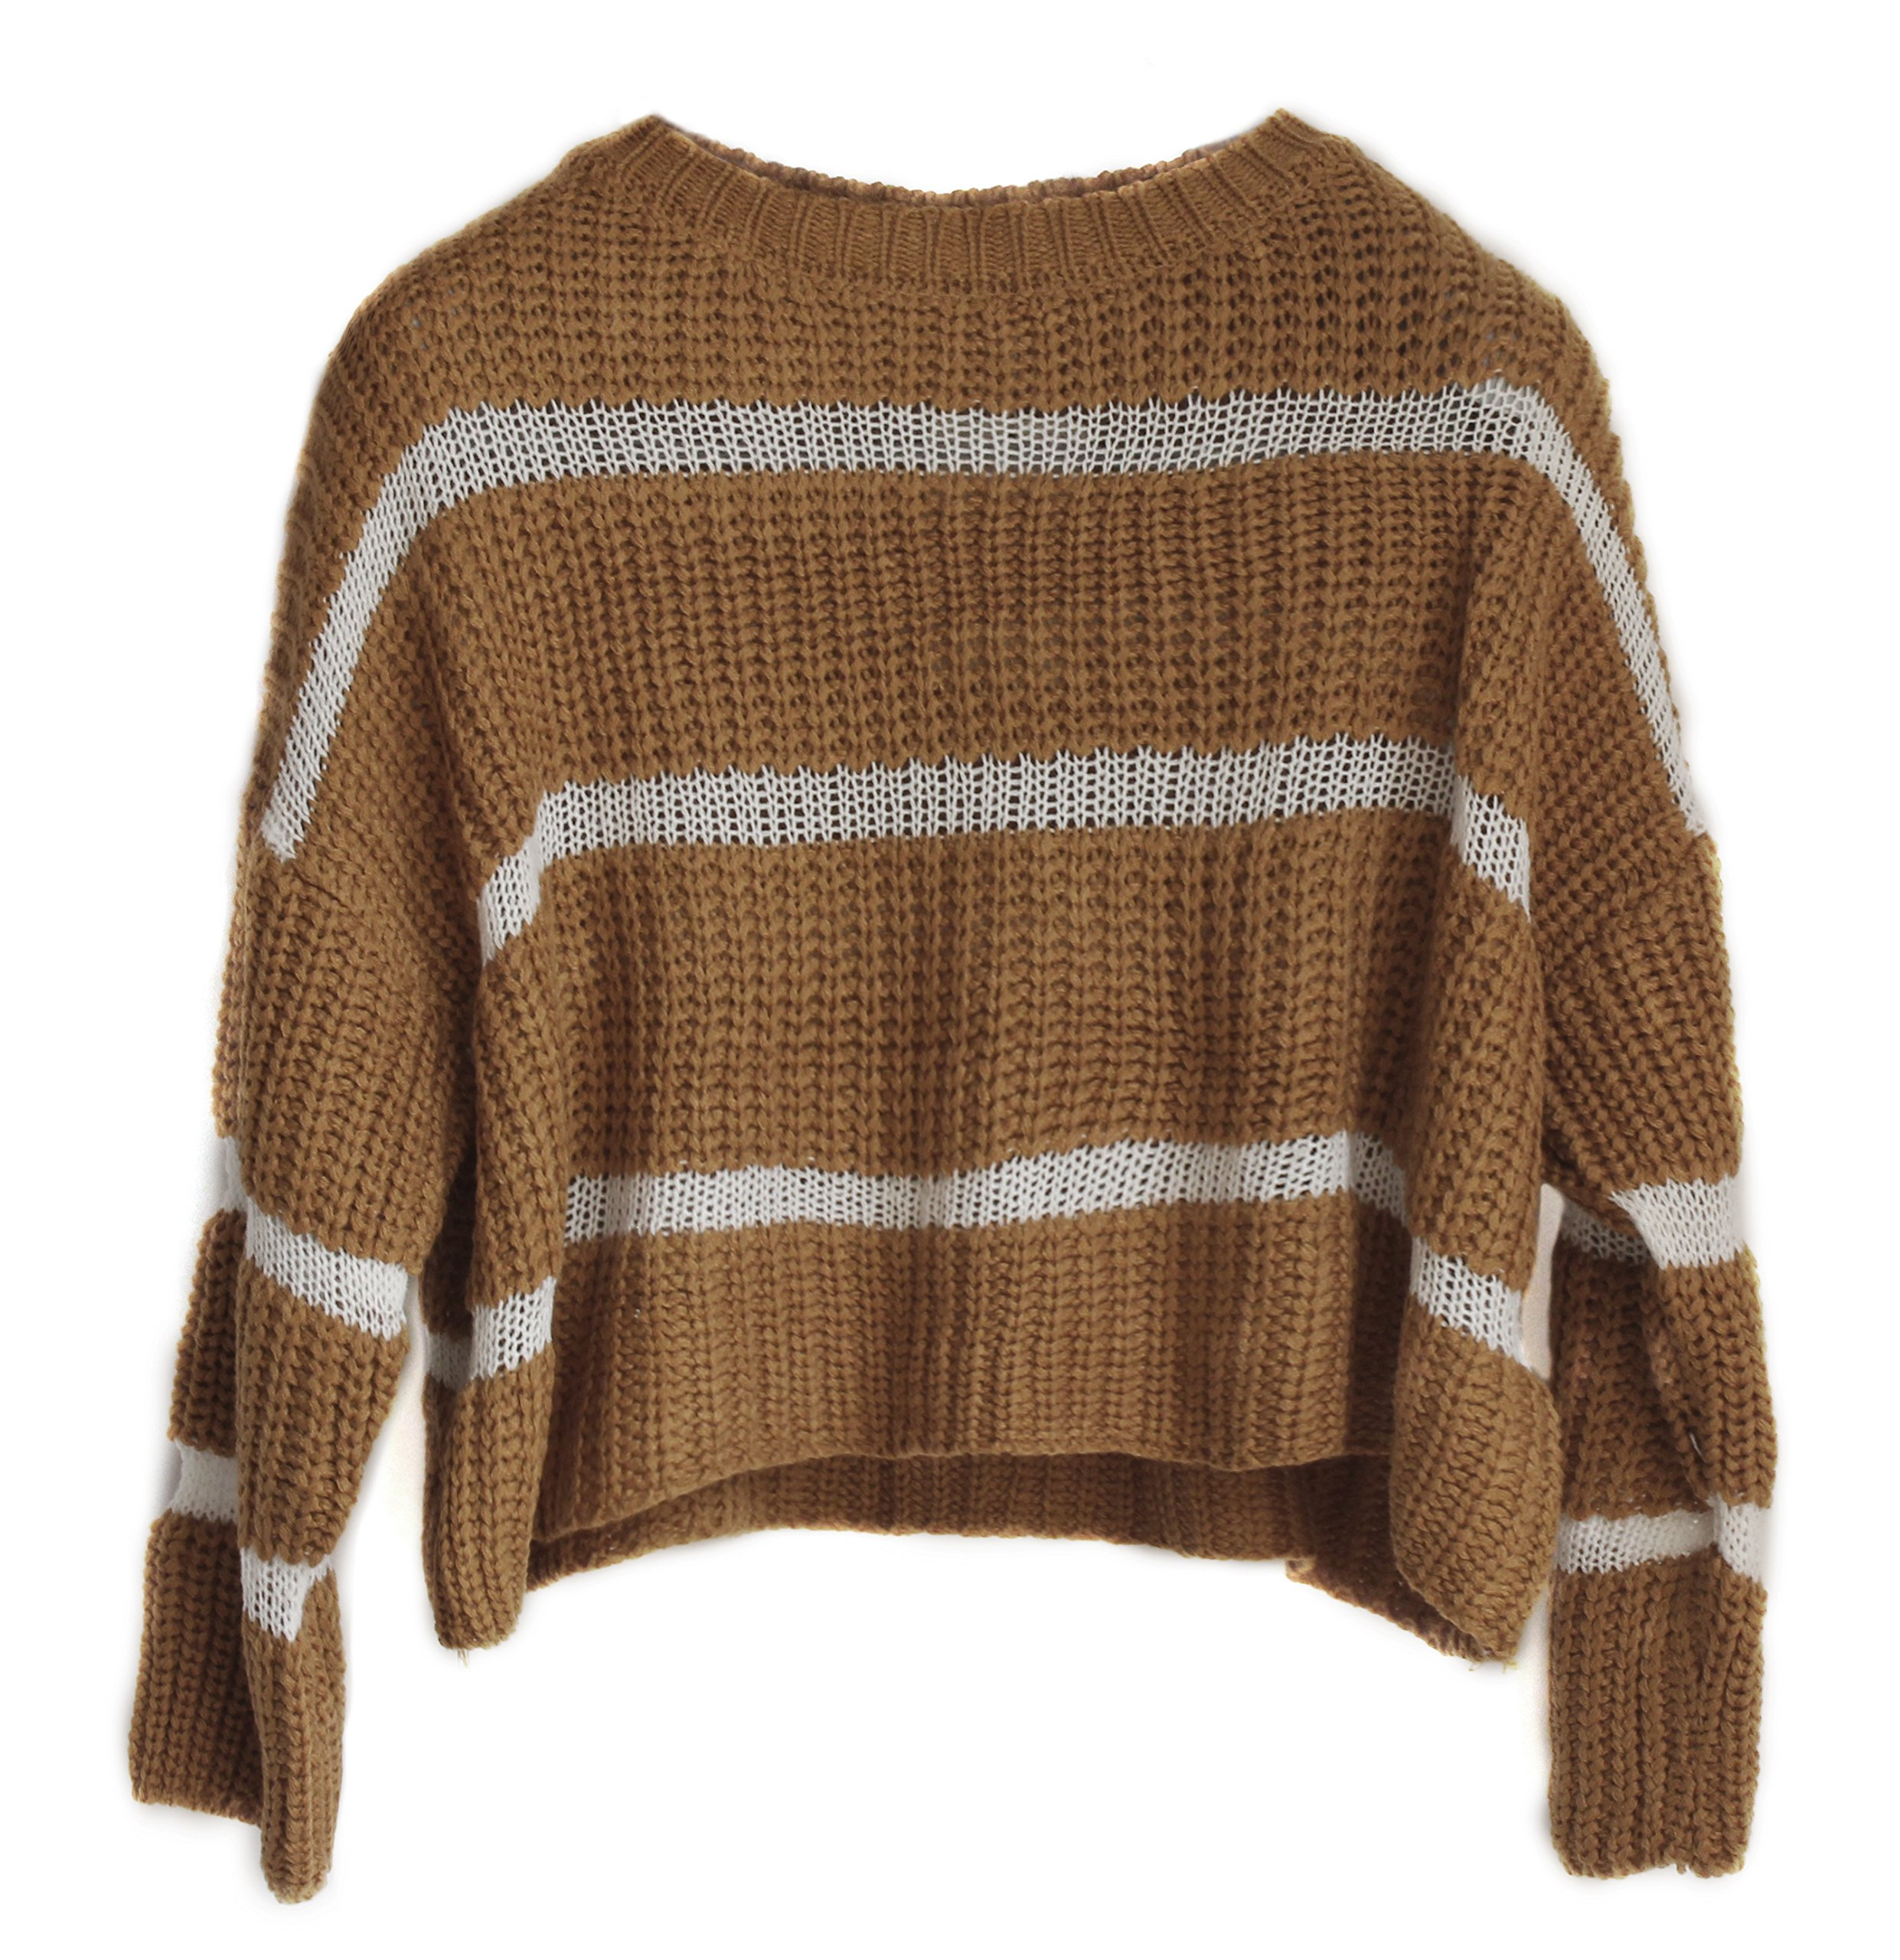 Goddess Area Women's Casual Long Sleeve Striped Knit Short Crop Pullover Tops Jumper Sweater Blouse (M, Khaki)